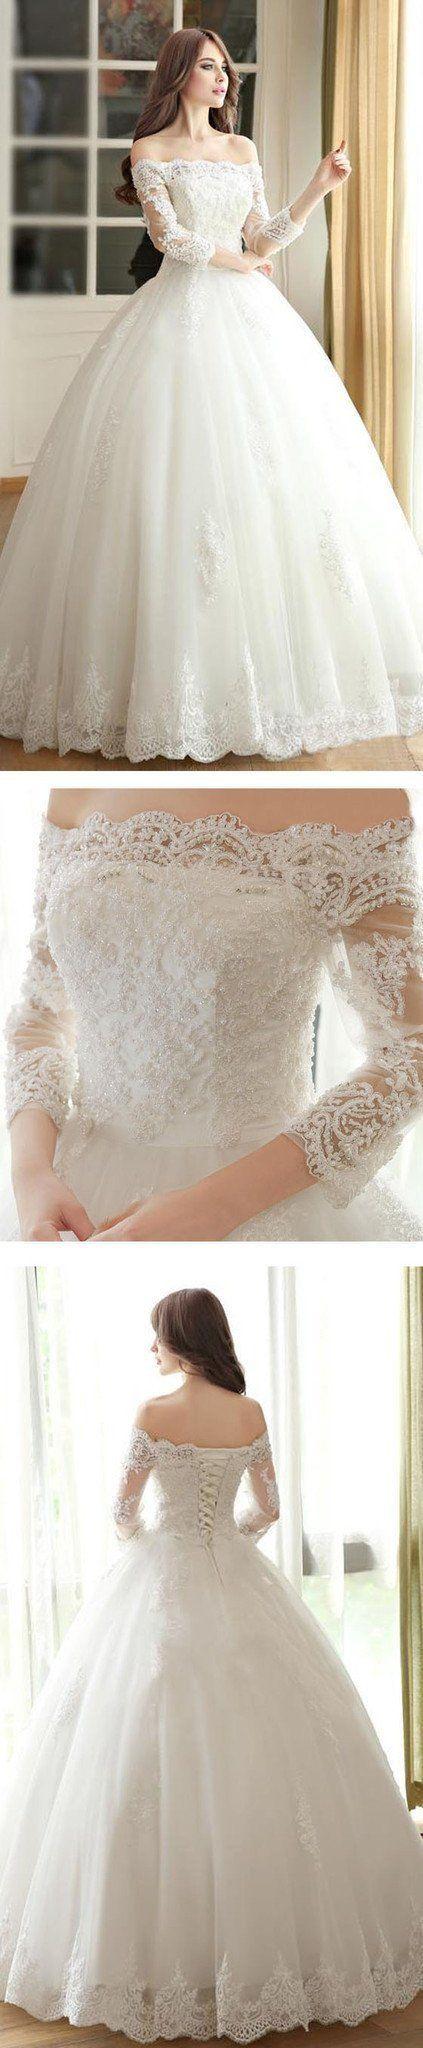 vantage off shoulder long sleeve white lace wedding dresses